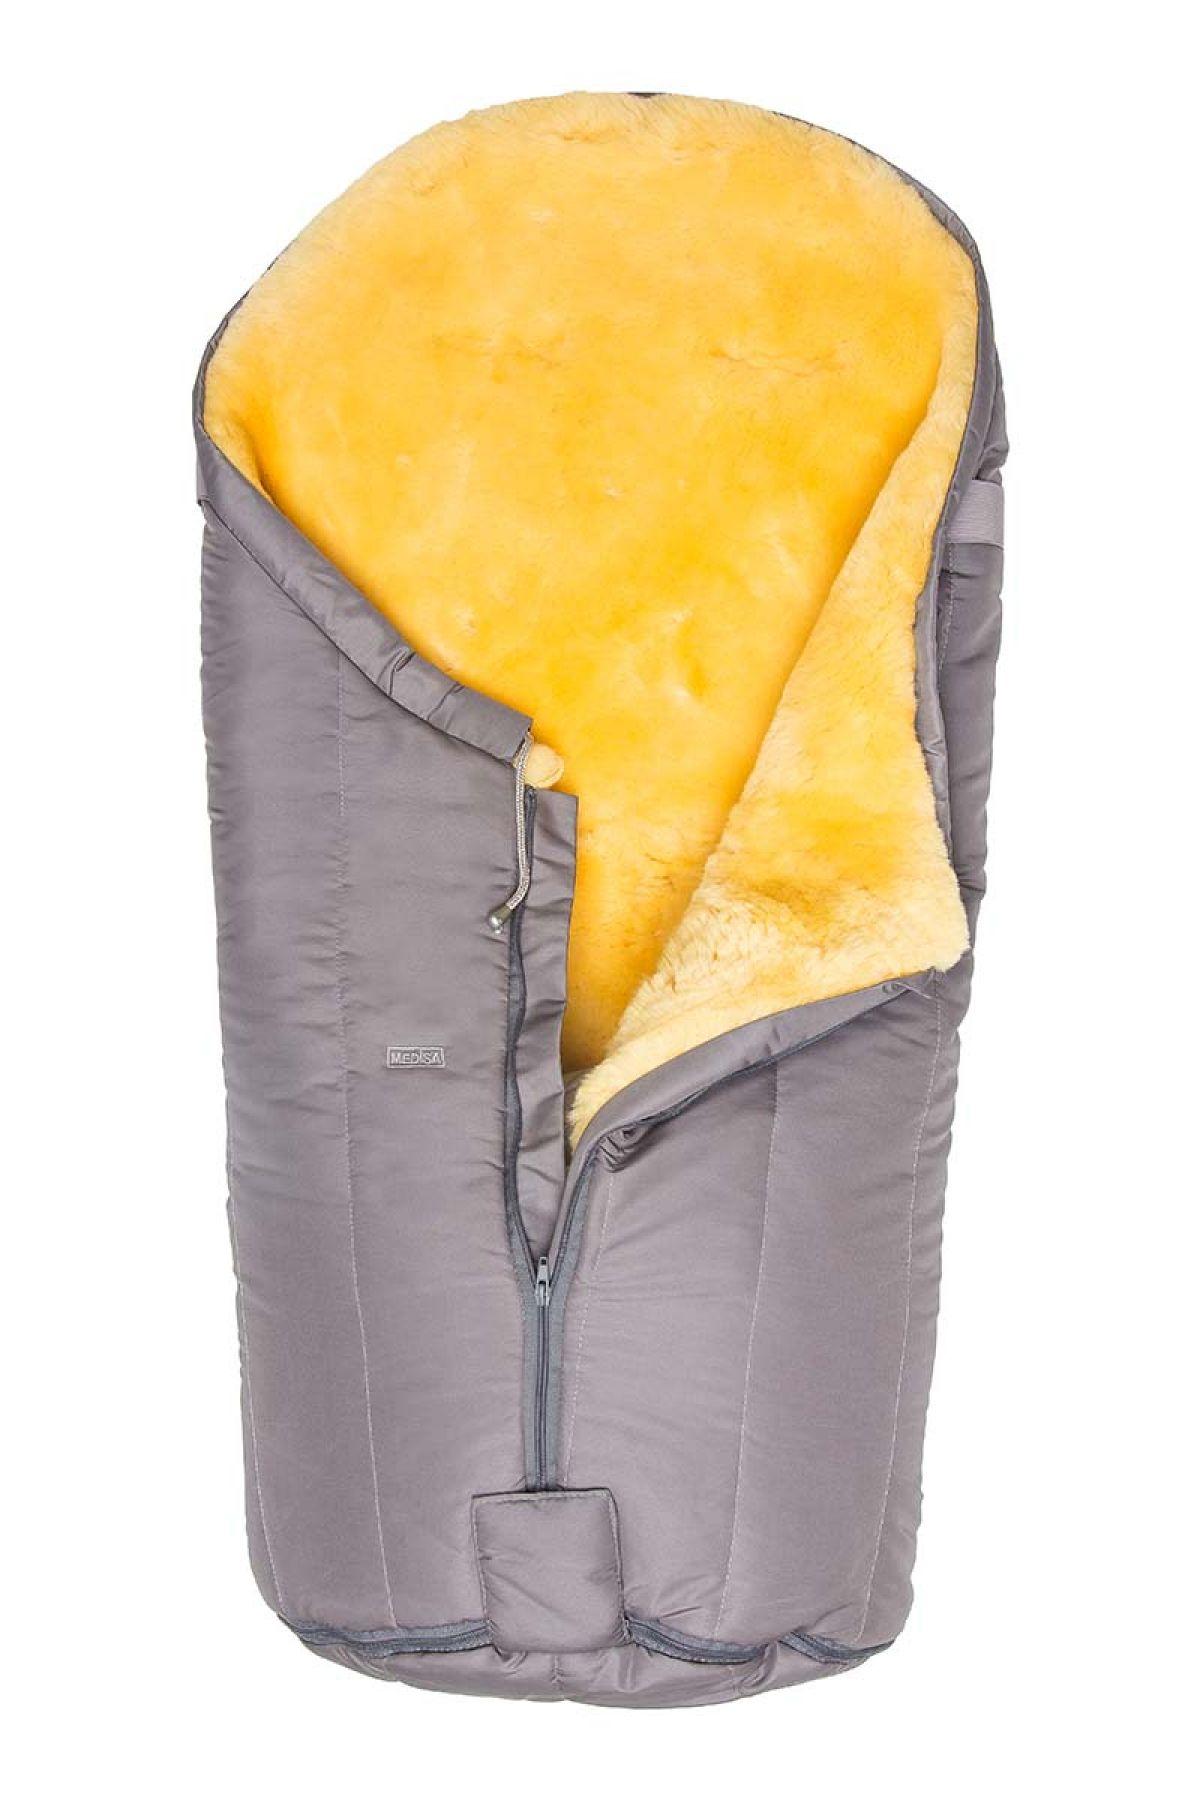 Sheepy Care Zippered Baby Sleeping Bag  MDK013 Gray